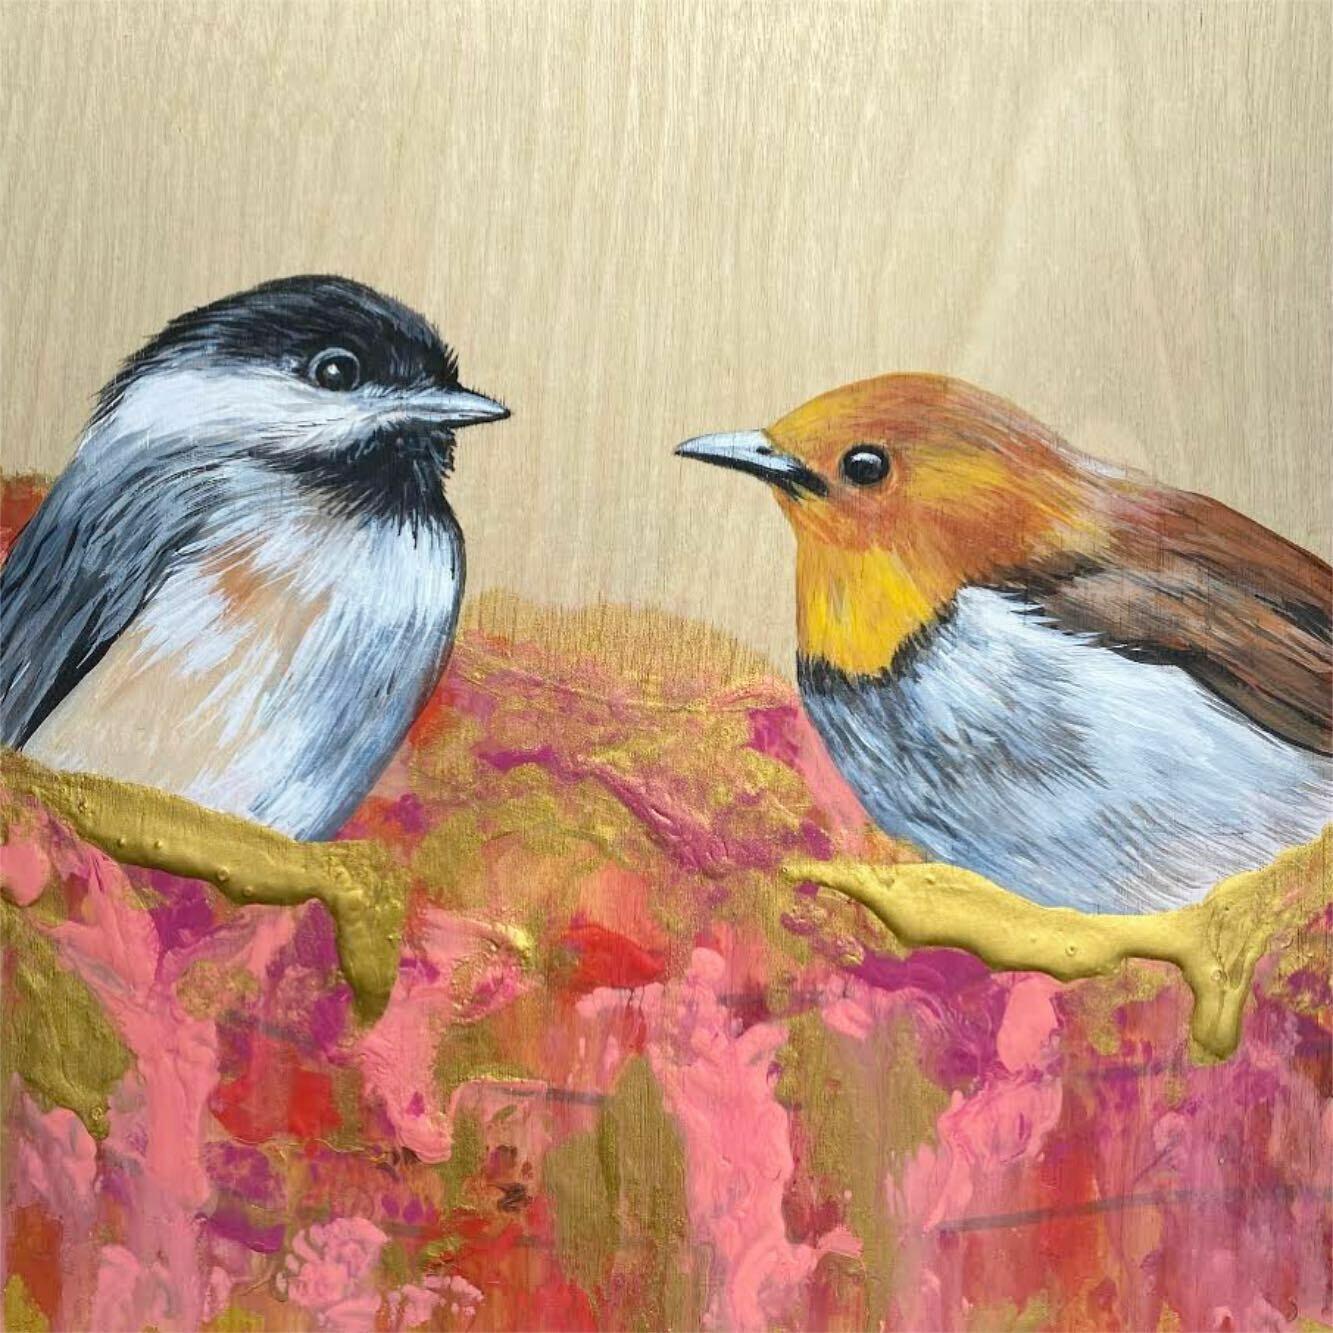 Carolina Chickadee and Friend on wood board